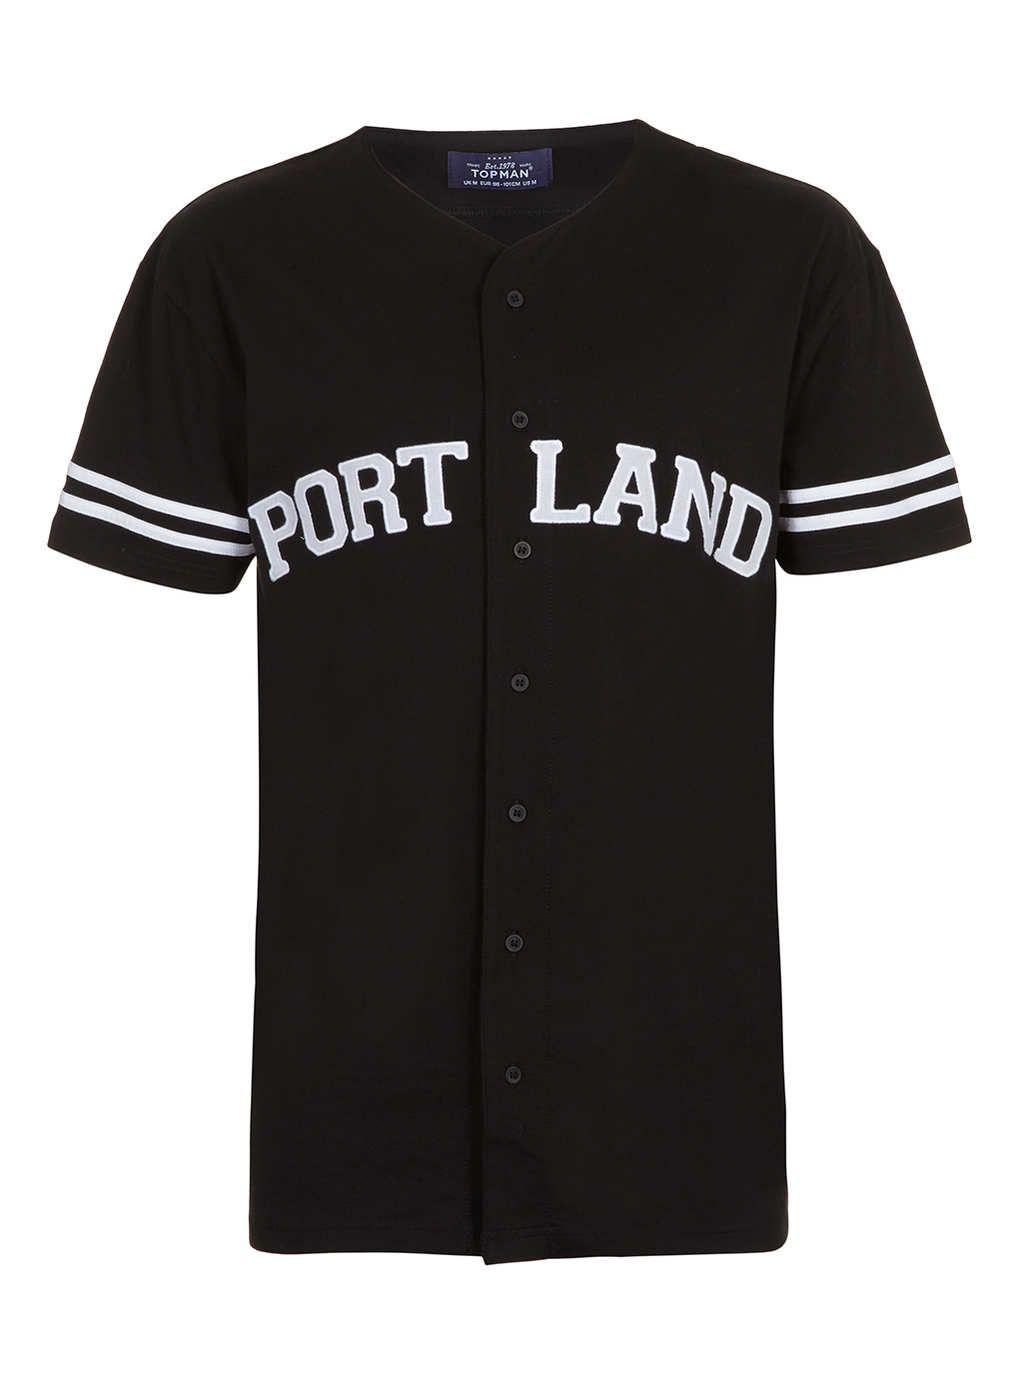 Black t shirt topman - Black Portland Baseball Shirt New This Week New In Topman